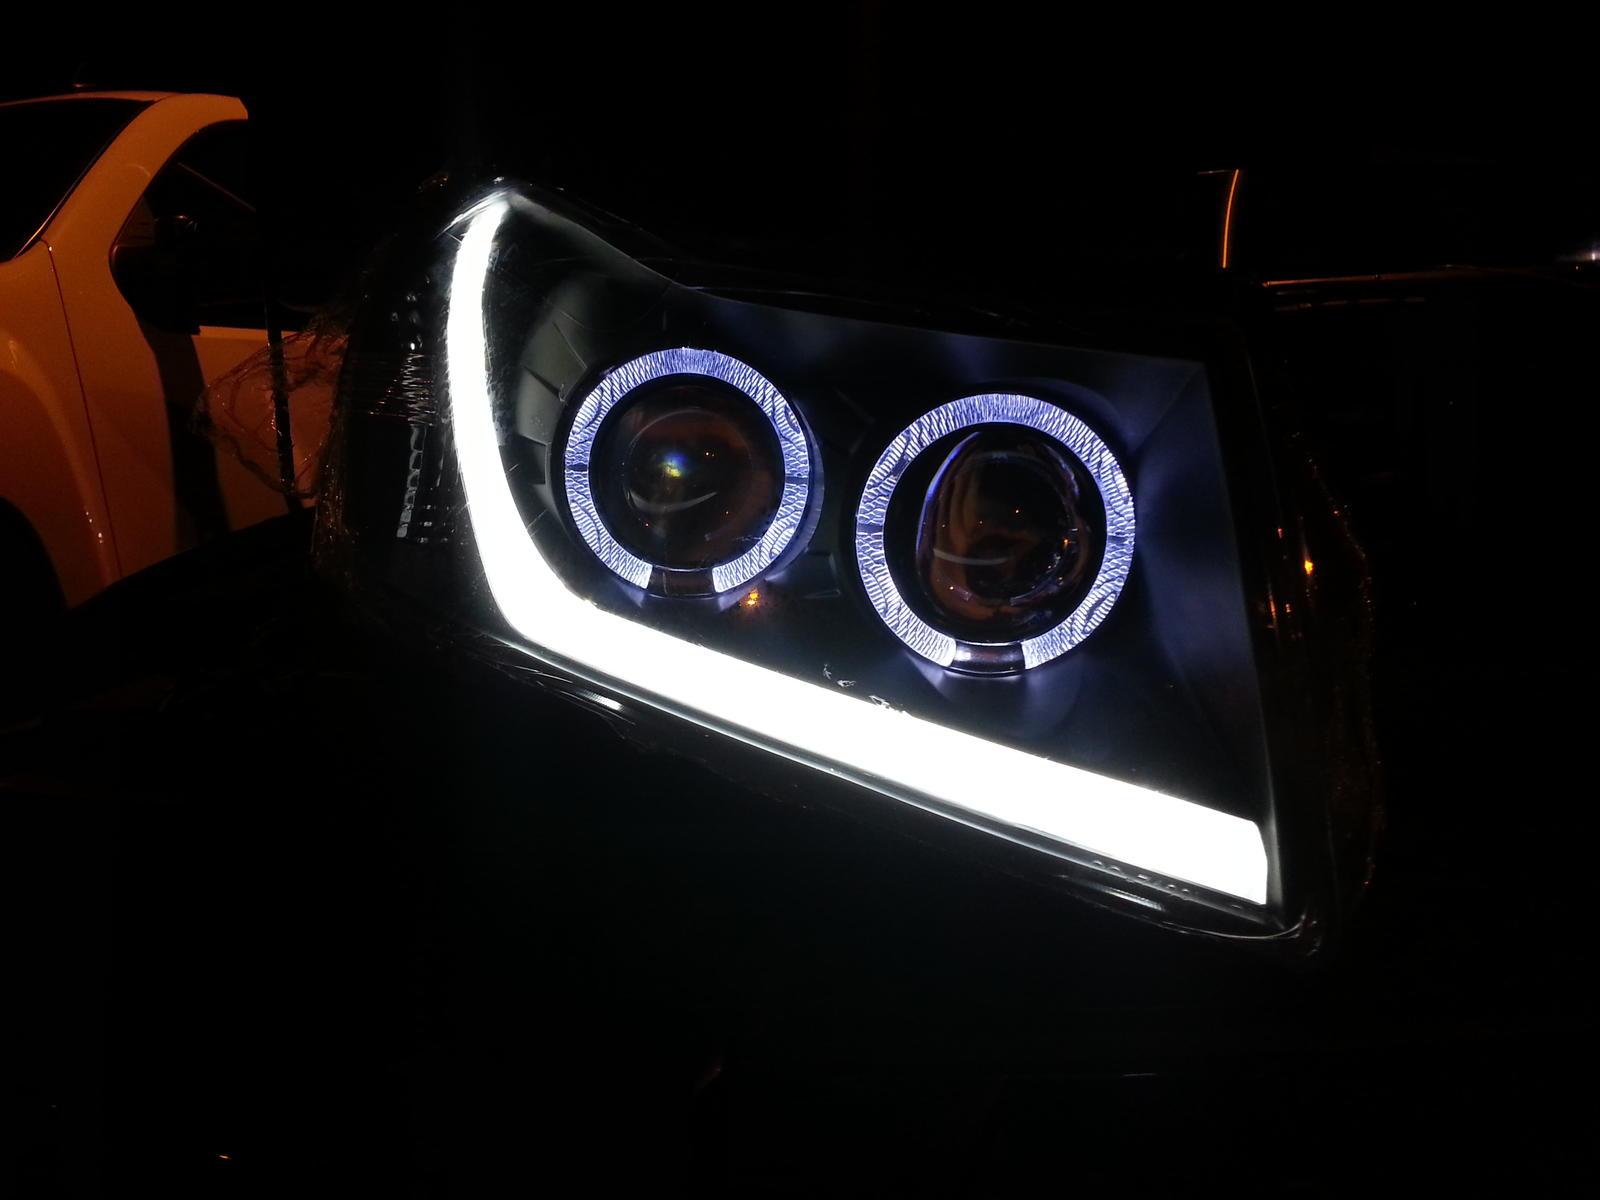 Spyder aftermarket Headlights